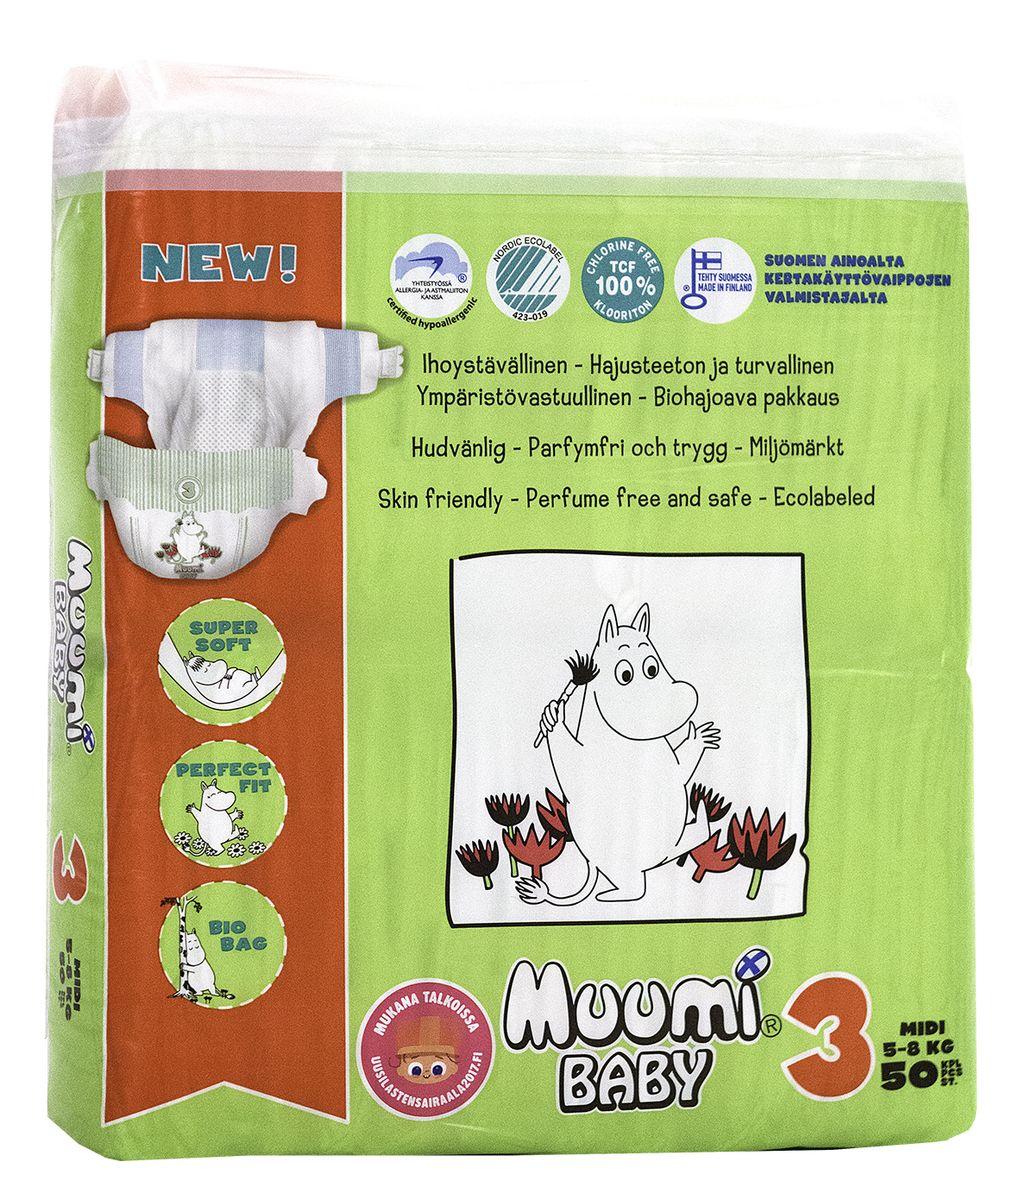 Muumi Подгузники Бейби Миди 3, 5-8 кг, 50 шт greenty подгузники 5 10 кг 48 шт